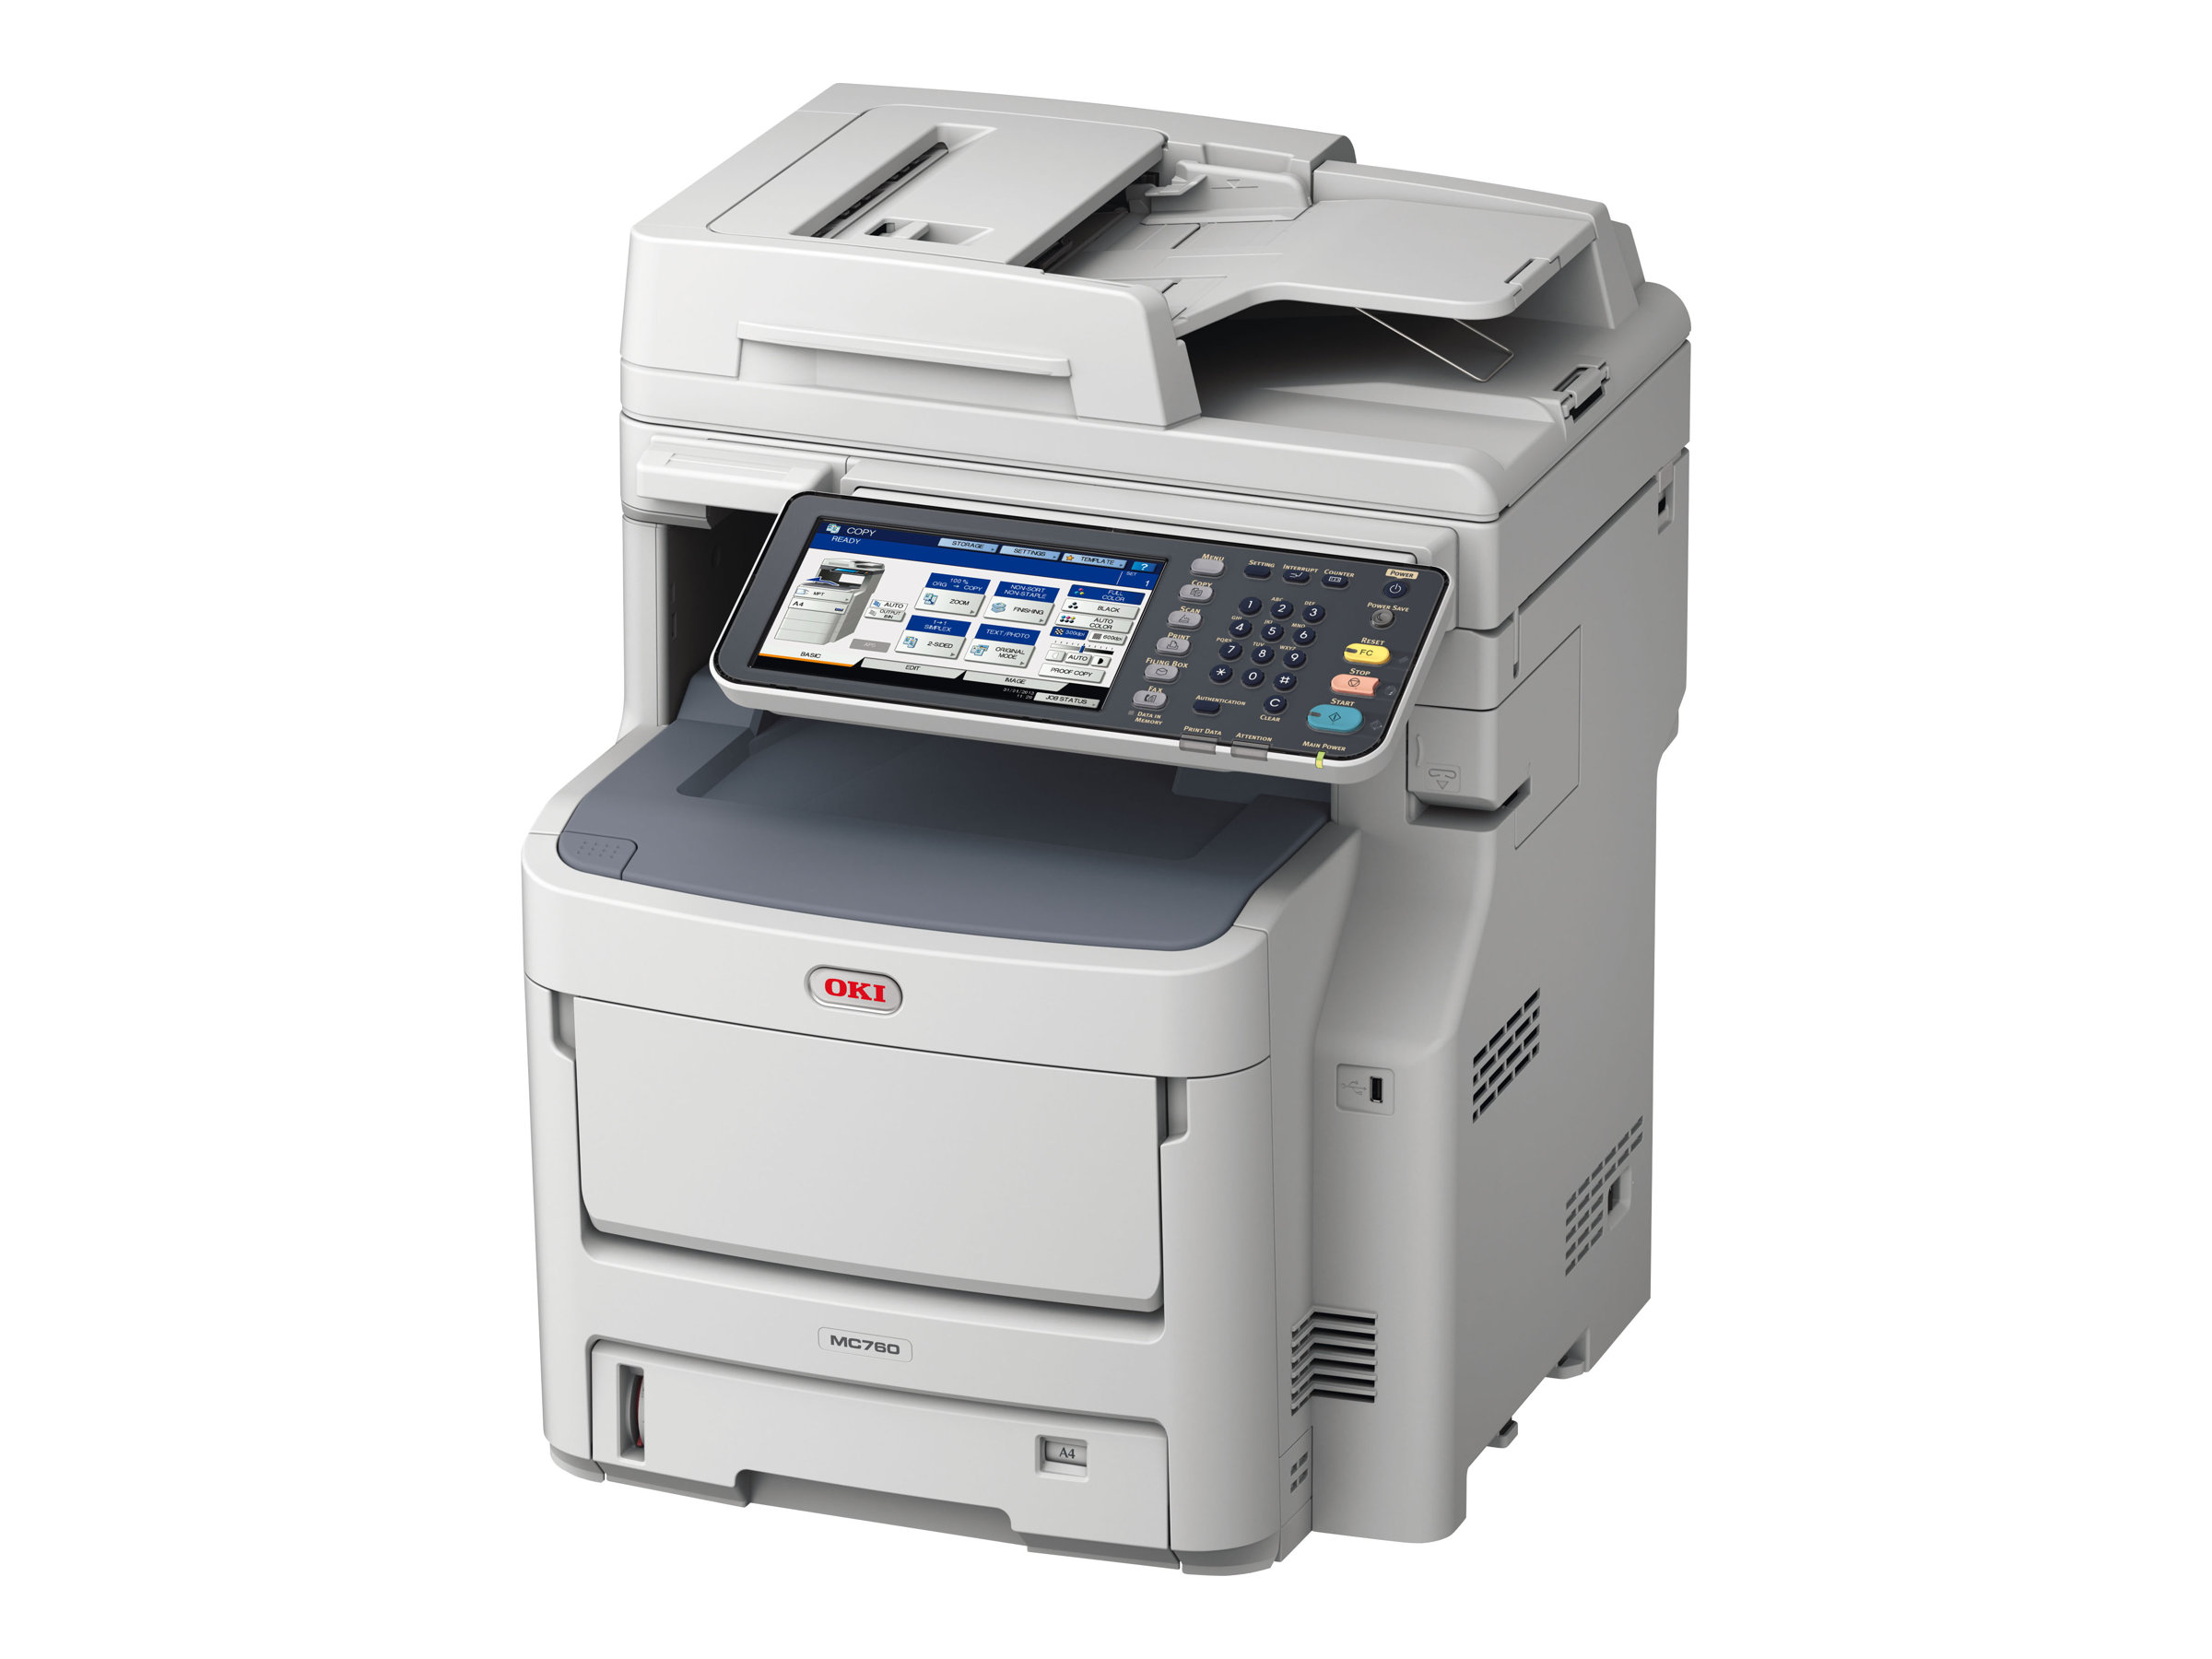 OKI MC760dn - Multifunktionsdrucker - Farbe - LED - A4 (210 x 297 mm) (Original) - A4 (Medien)